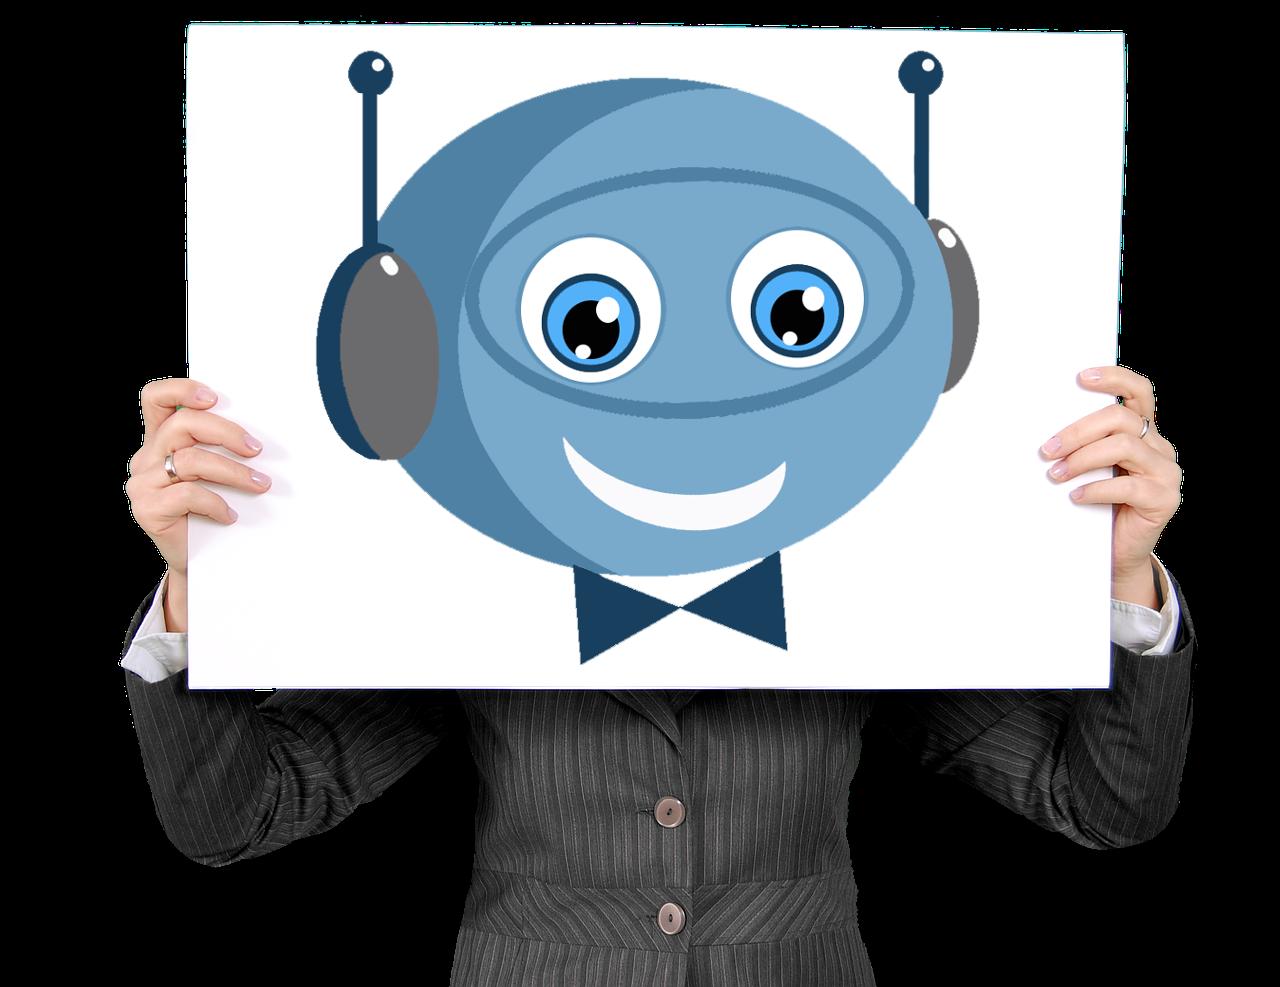 About Smart E Bots - Facebook Messenger Chatbot Developers